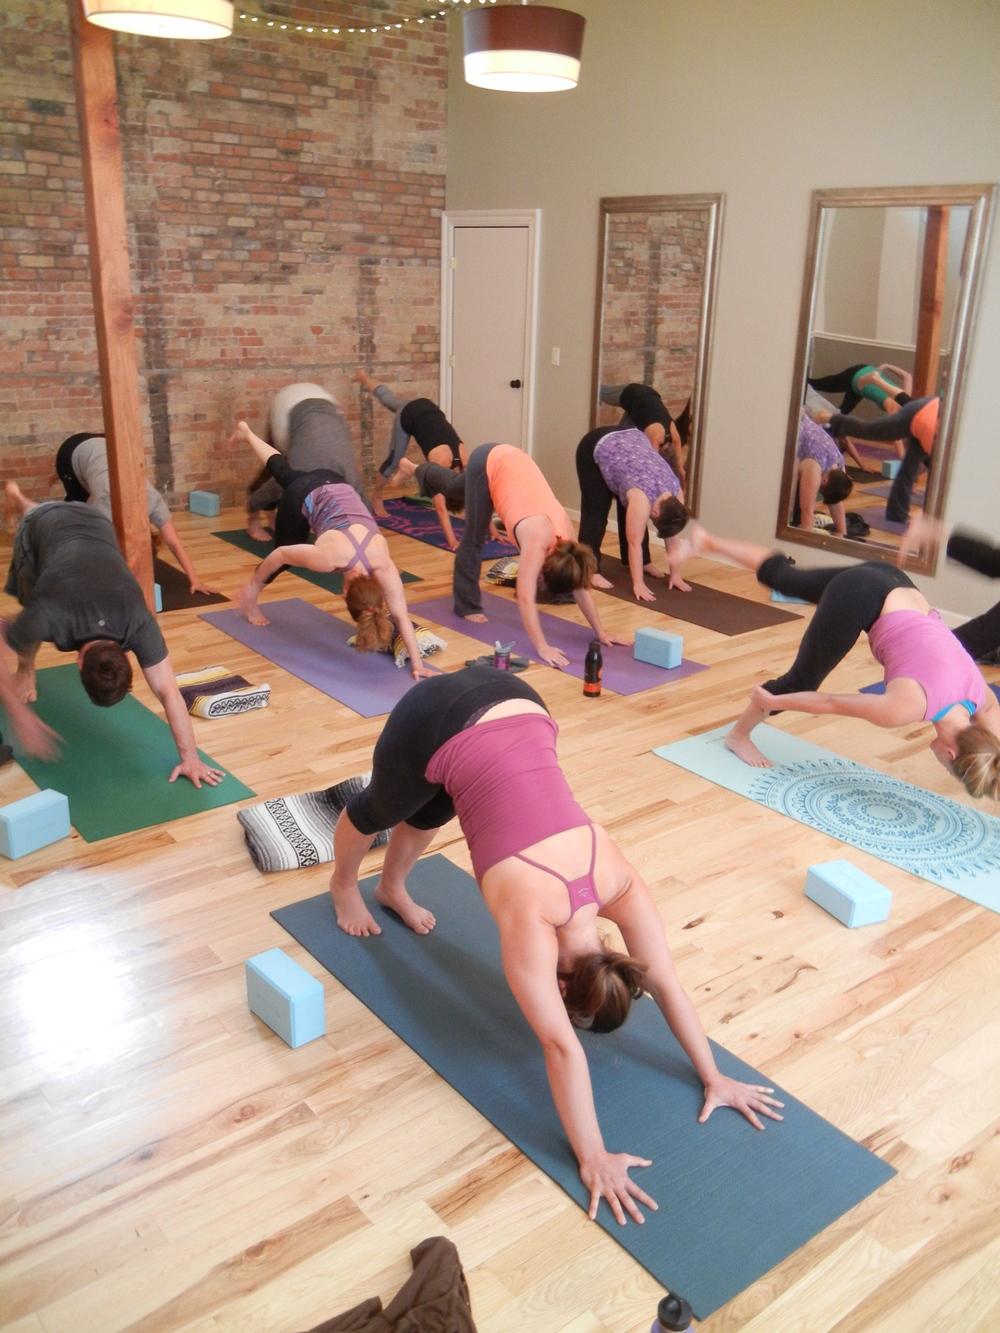 providence-apothecary-yoga-center-1428101537.jpg